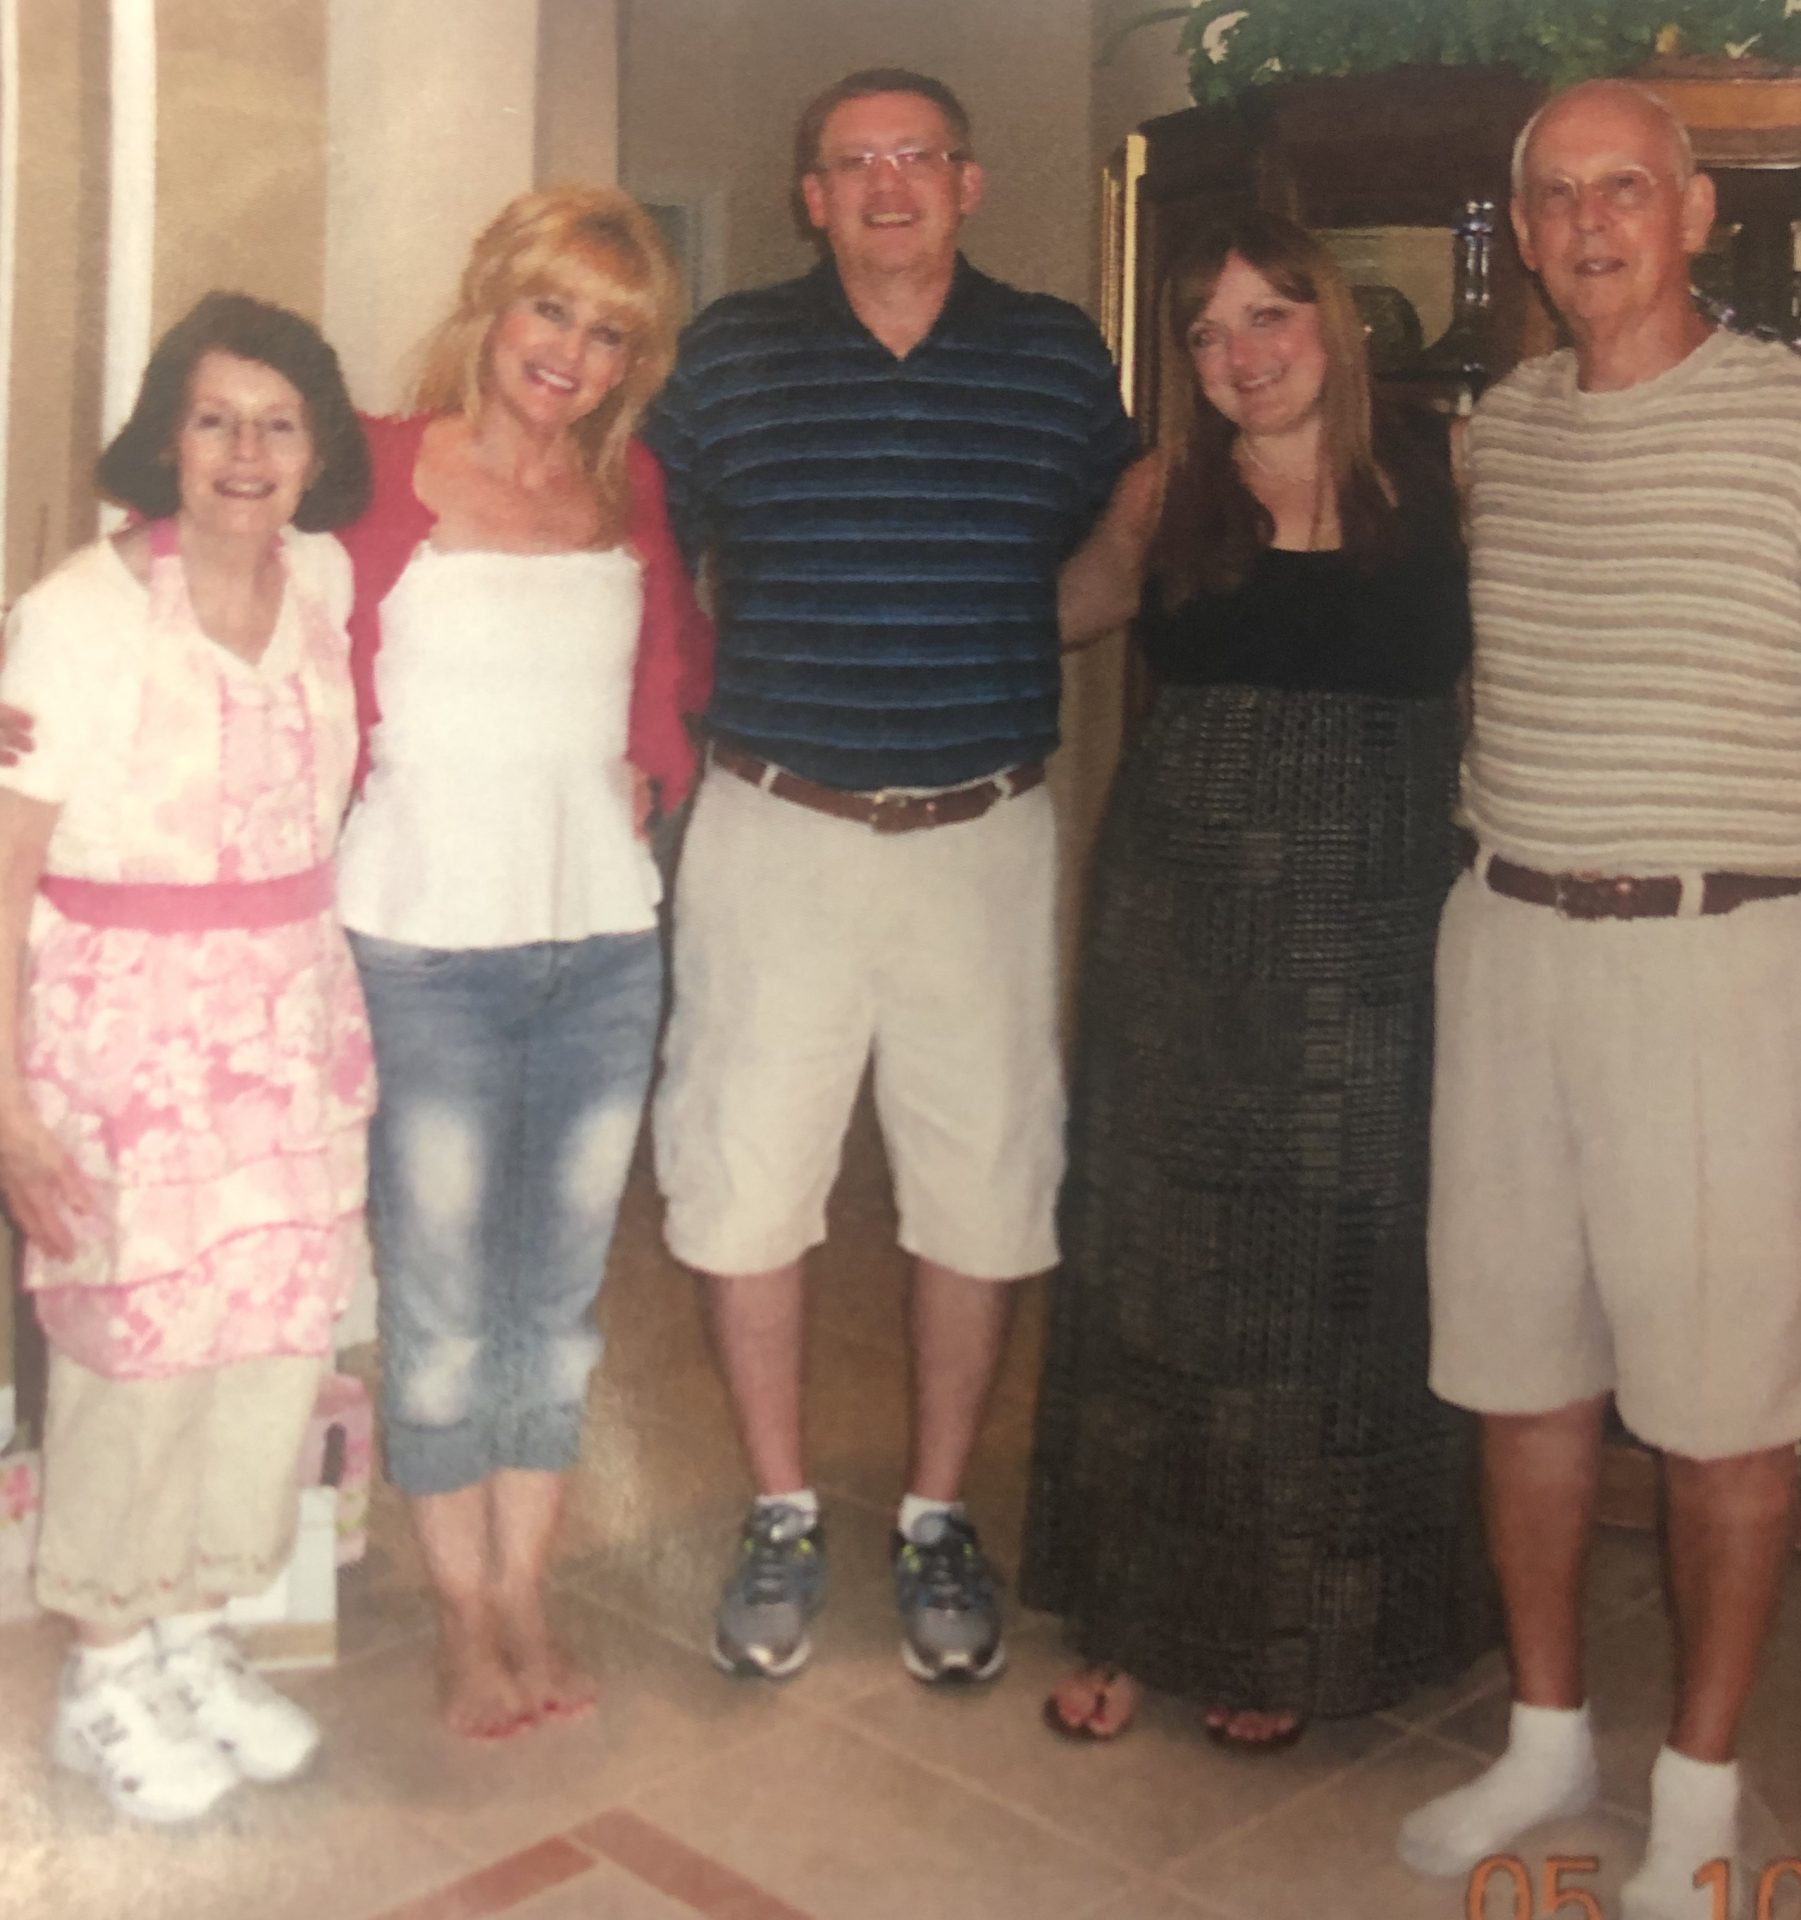 Polly, Lisa, Jeff, Ashley and Paul